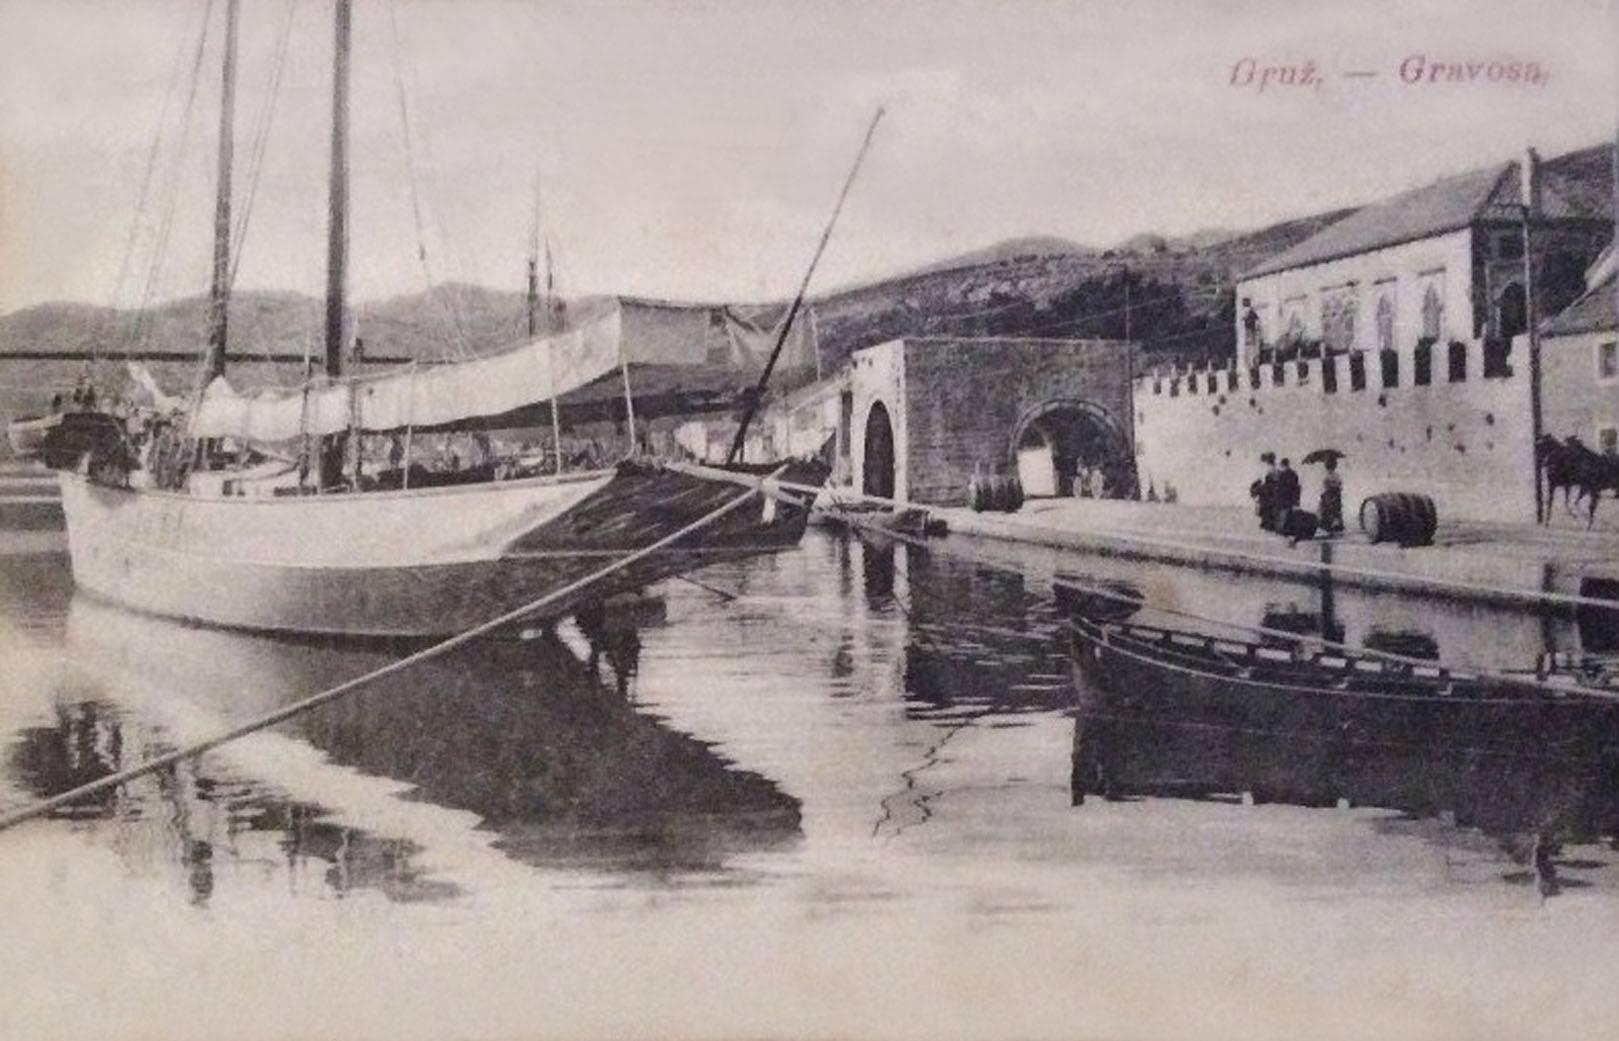 gruz gravosa 1910